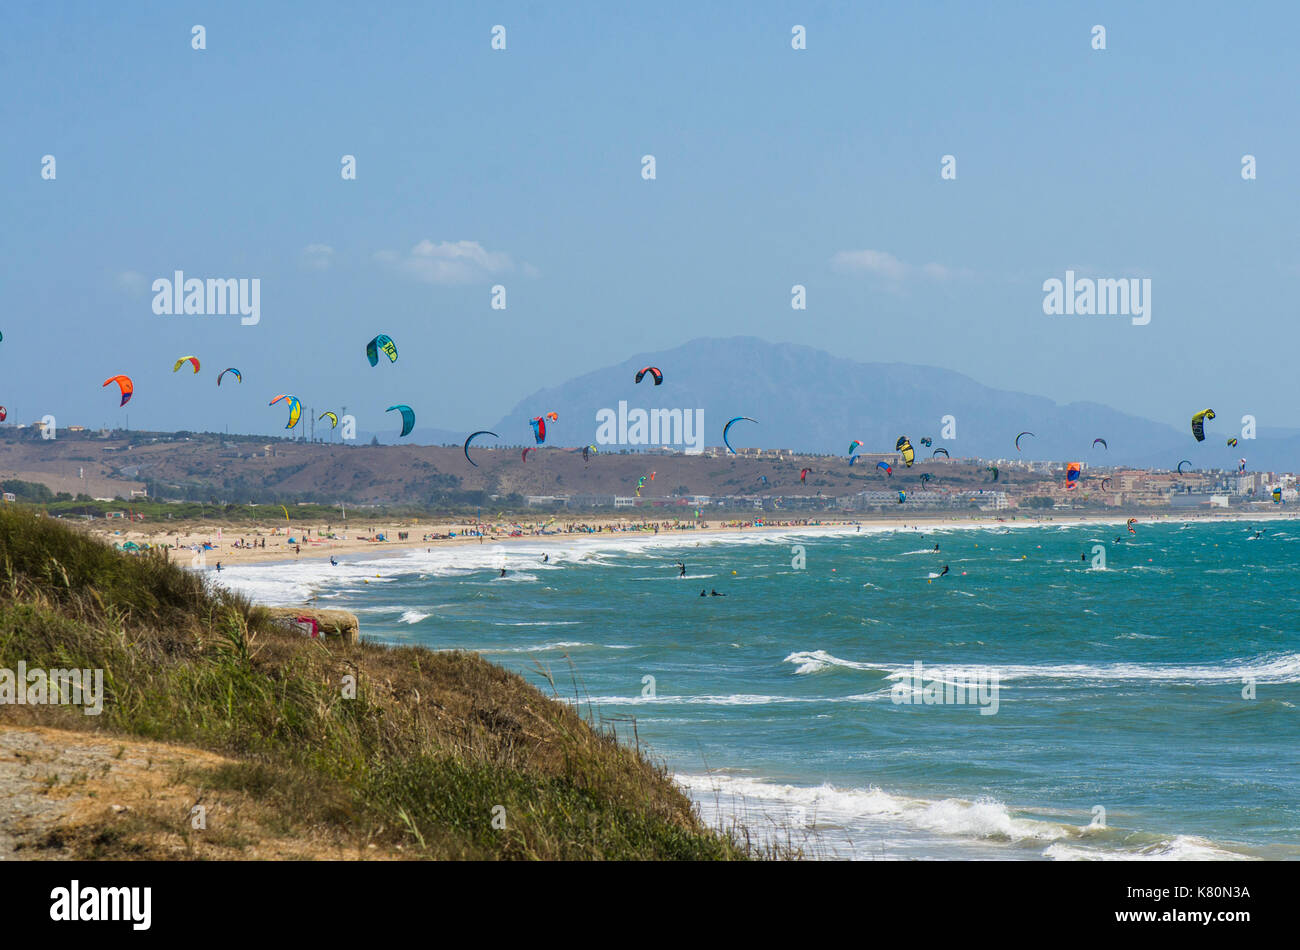 Kitesurfers and windsurfers on the beach at Ensenada de Bolonia, Costa de la Luz, Tarifa, Spain Stock Photo